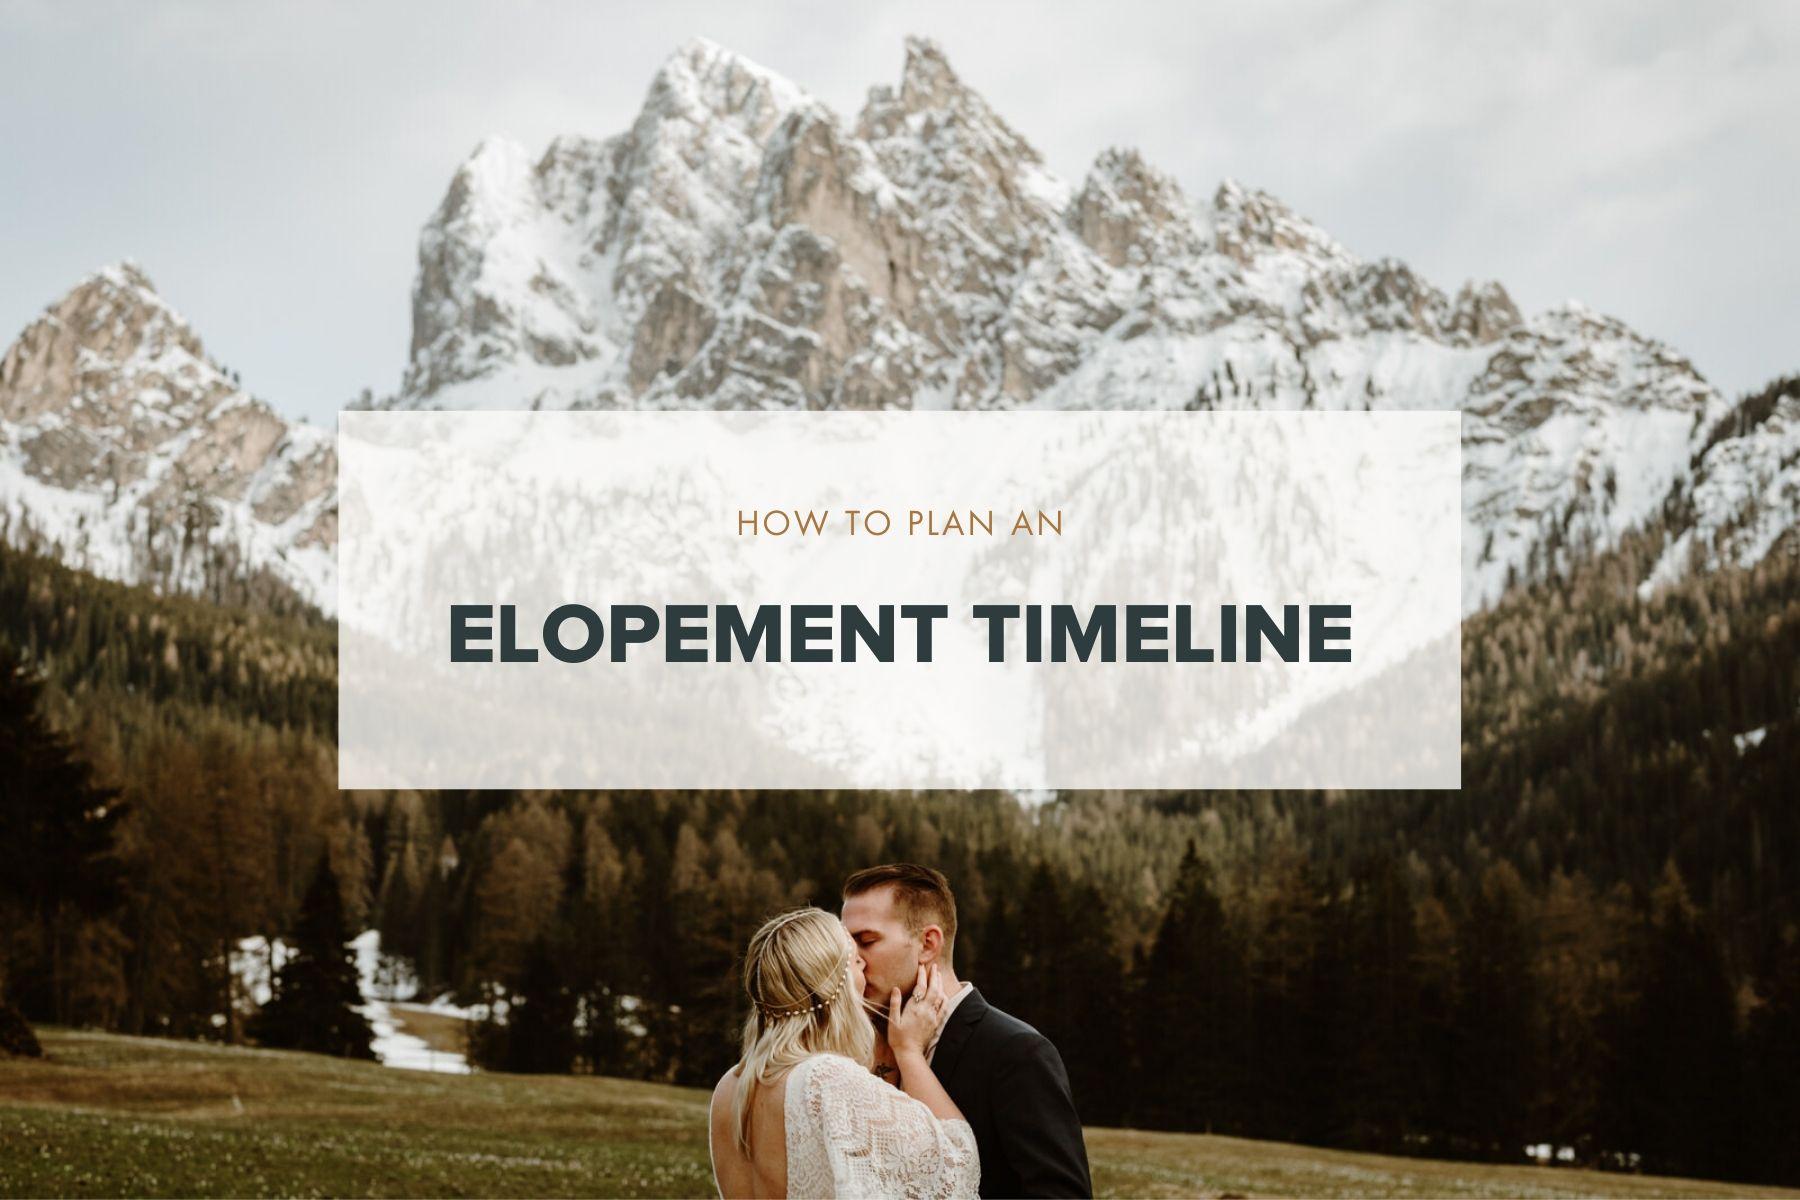 Planning an elopement Timeline